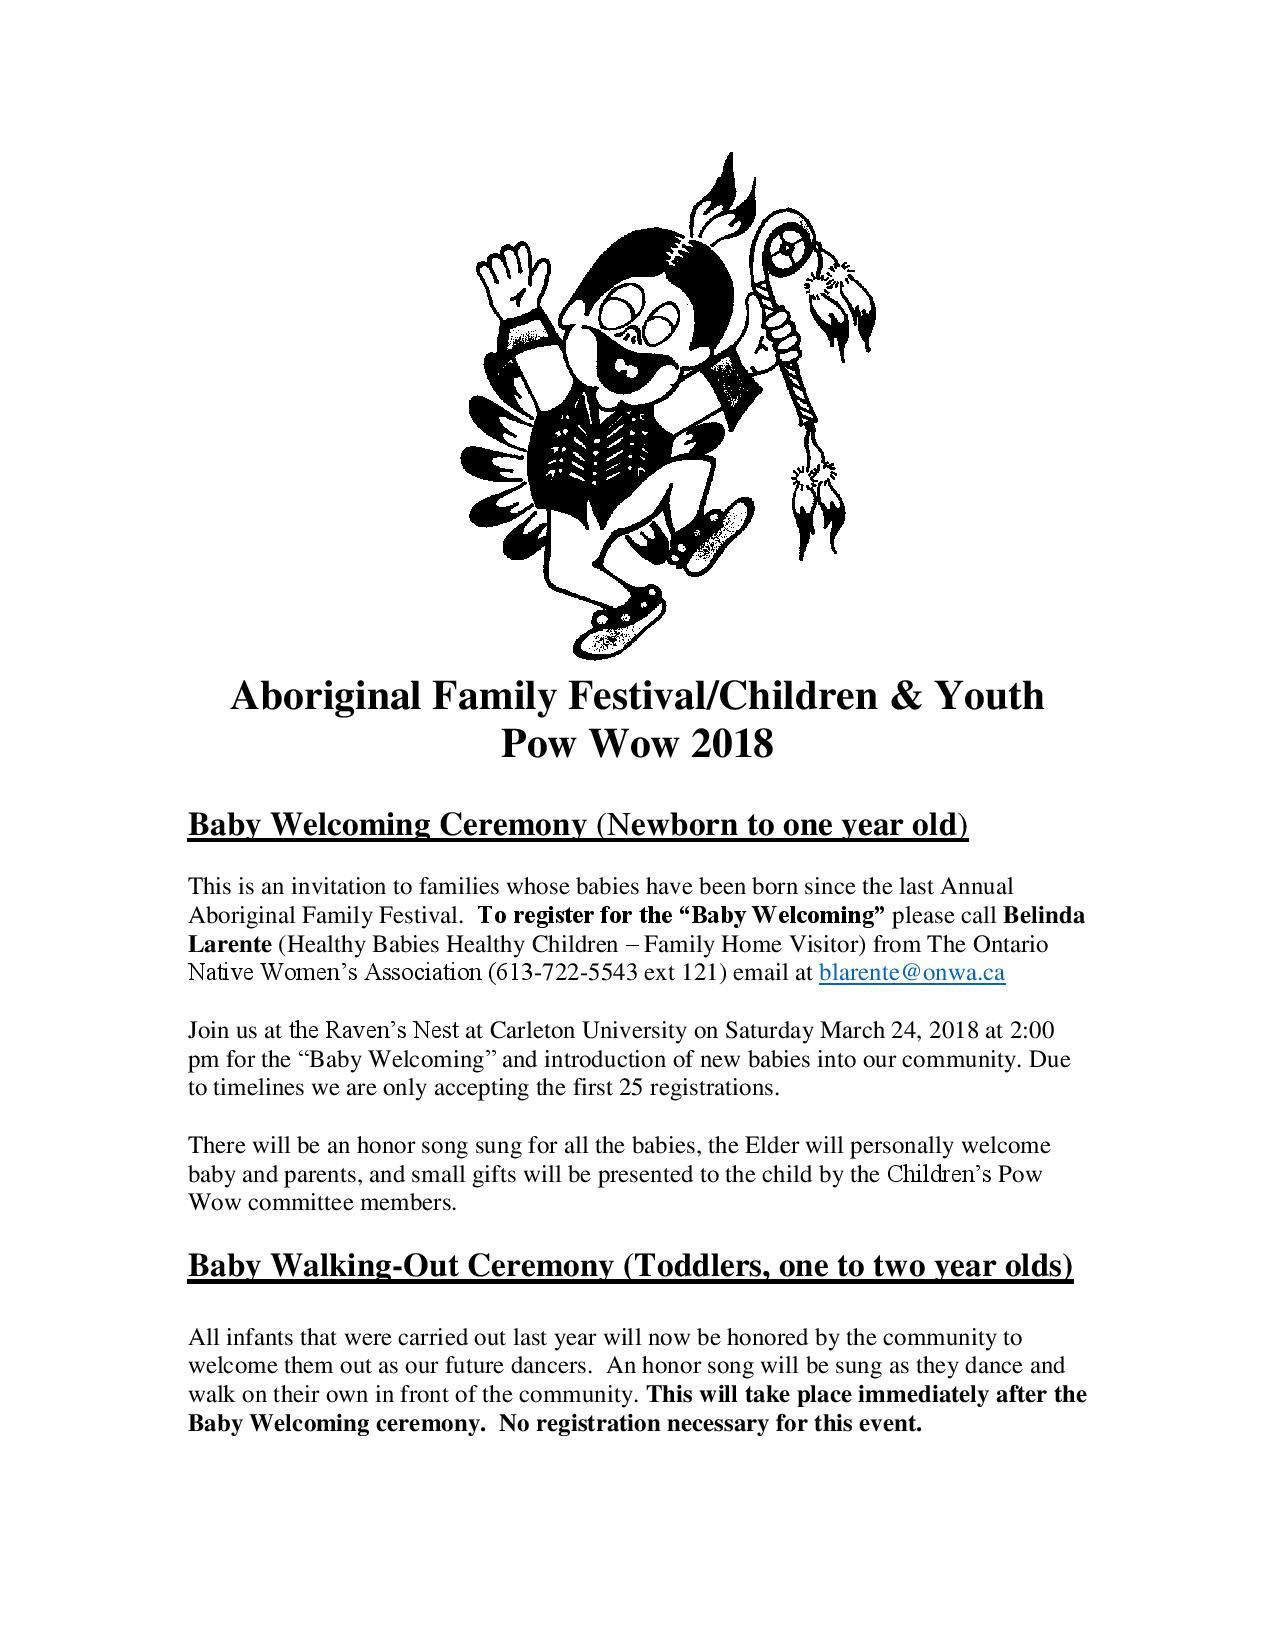 Odawa native friendship centre events poster biocorpaavc